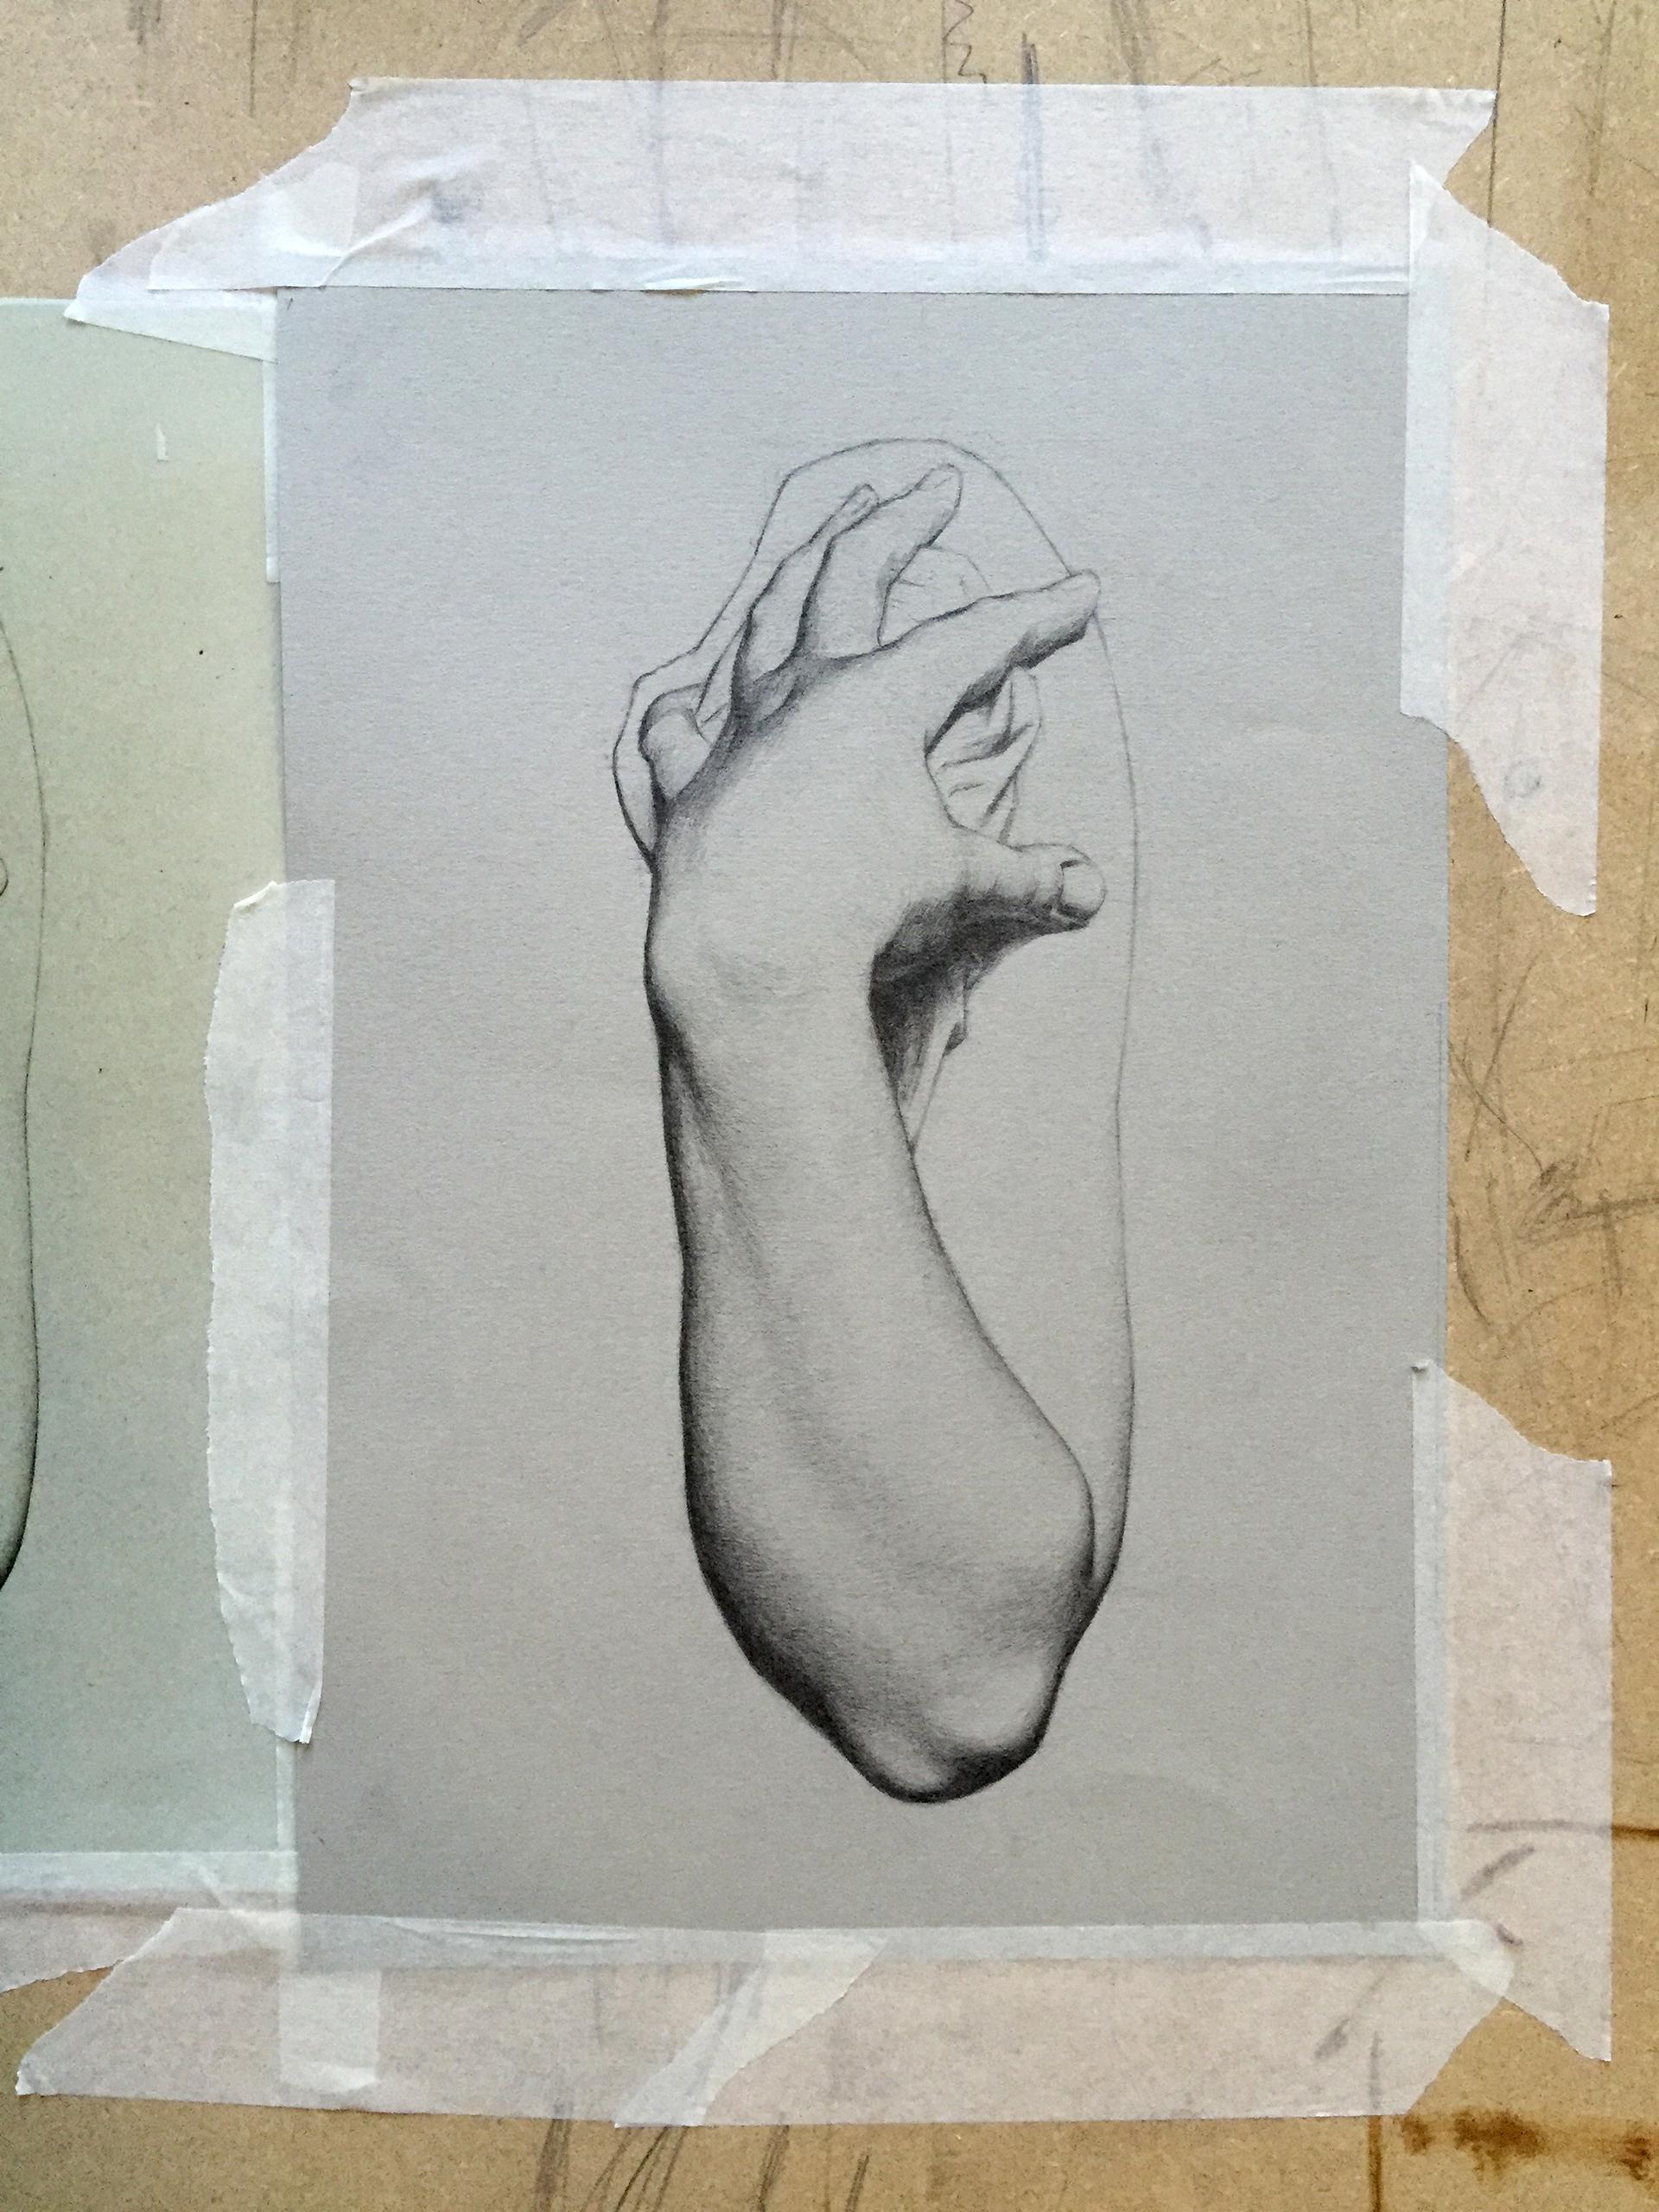 Charles Bargue Hand Study